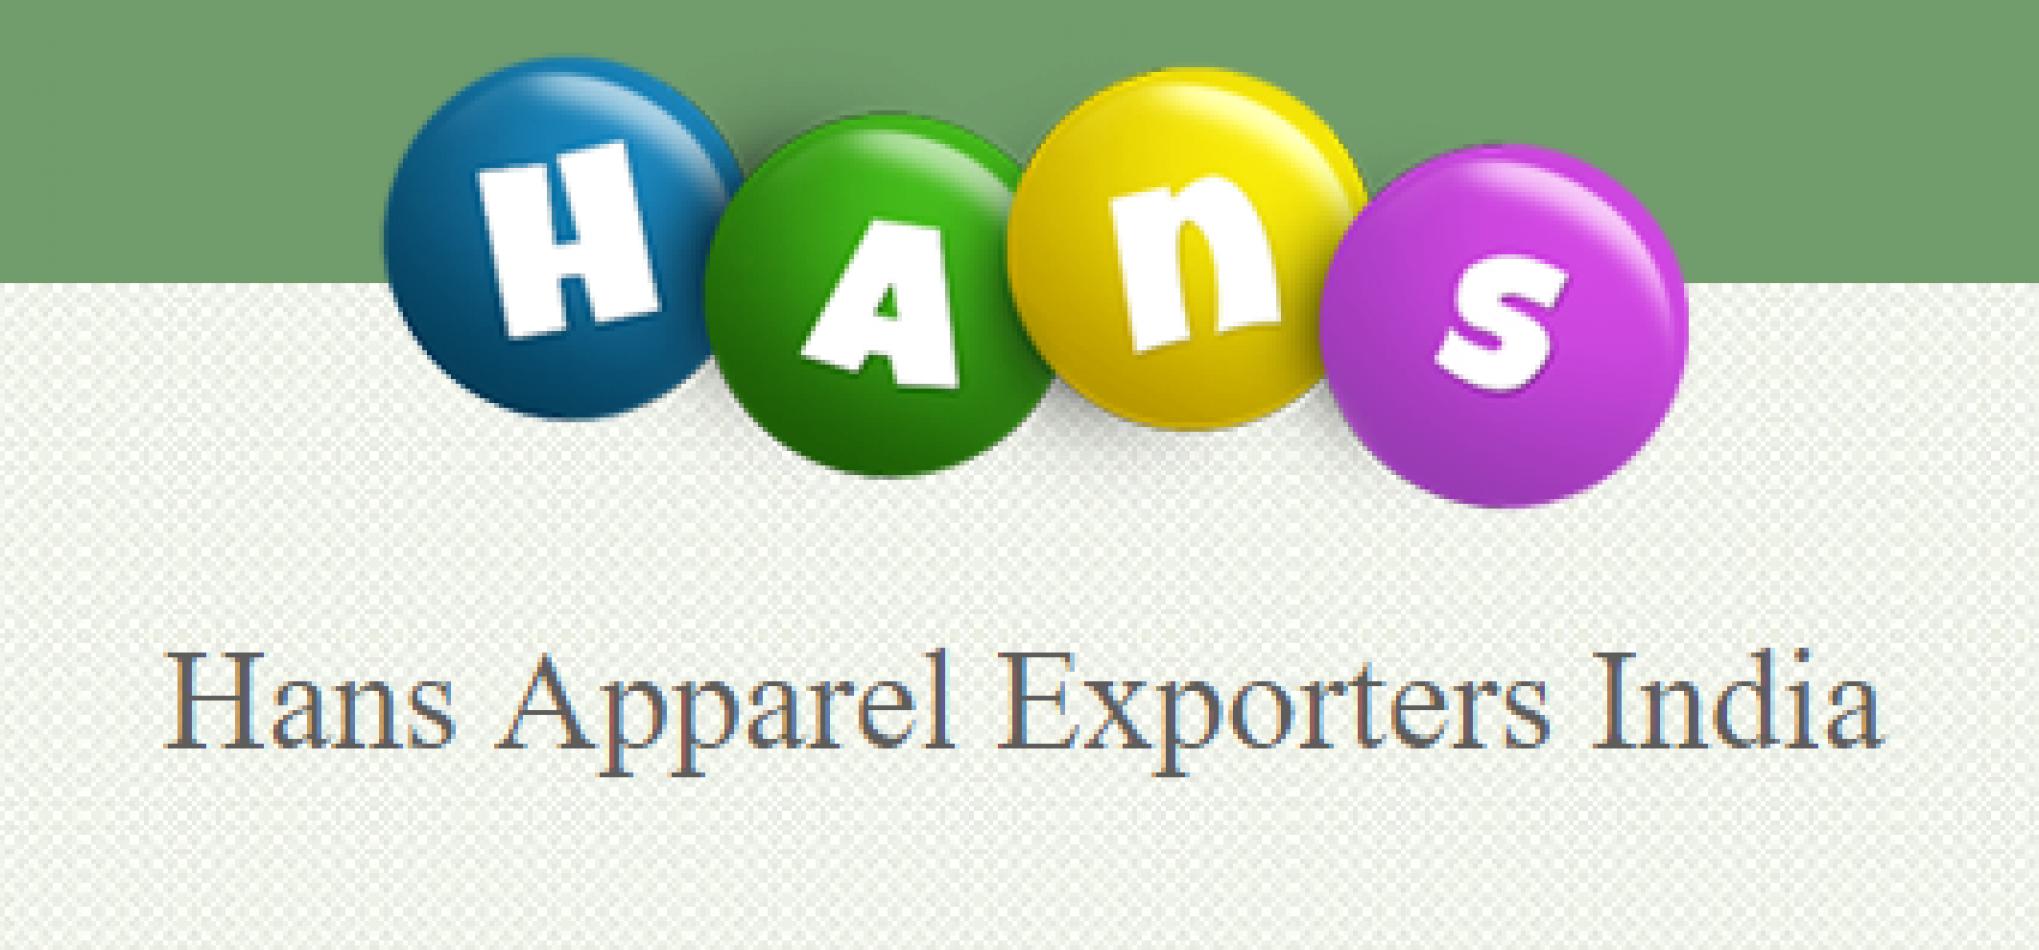 HNS INTERNATIONAL / HANS APPAREL EXPORTERS INDIA